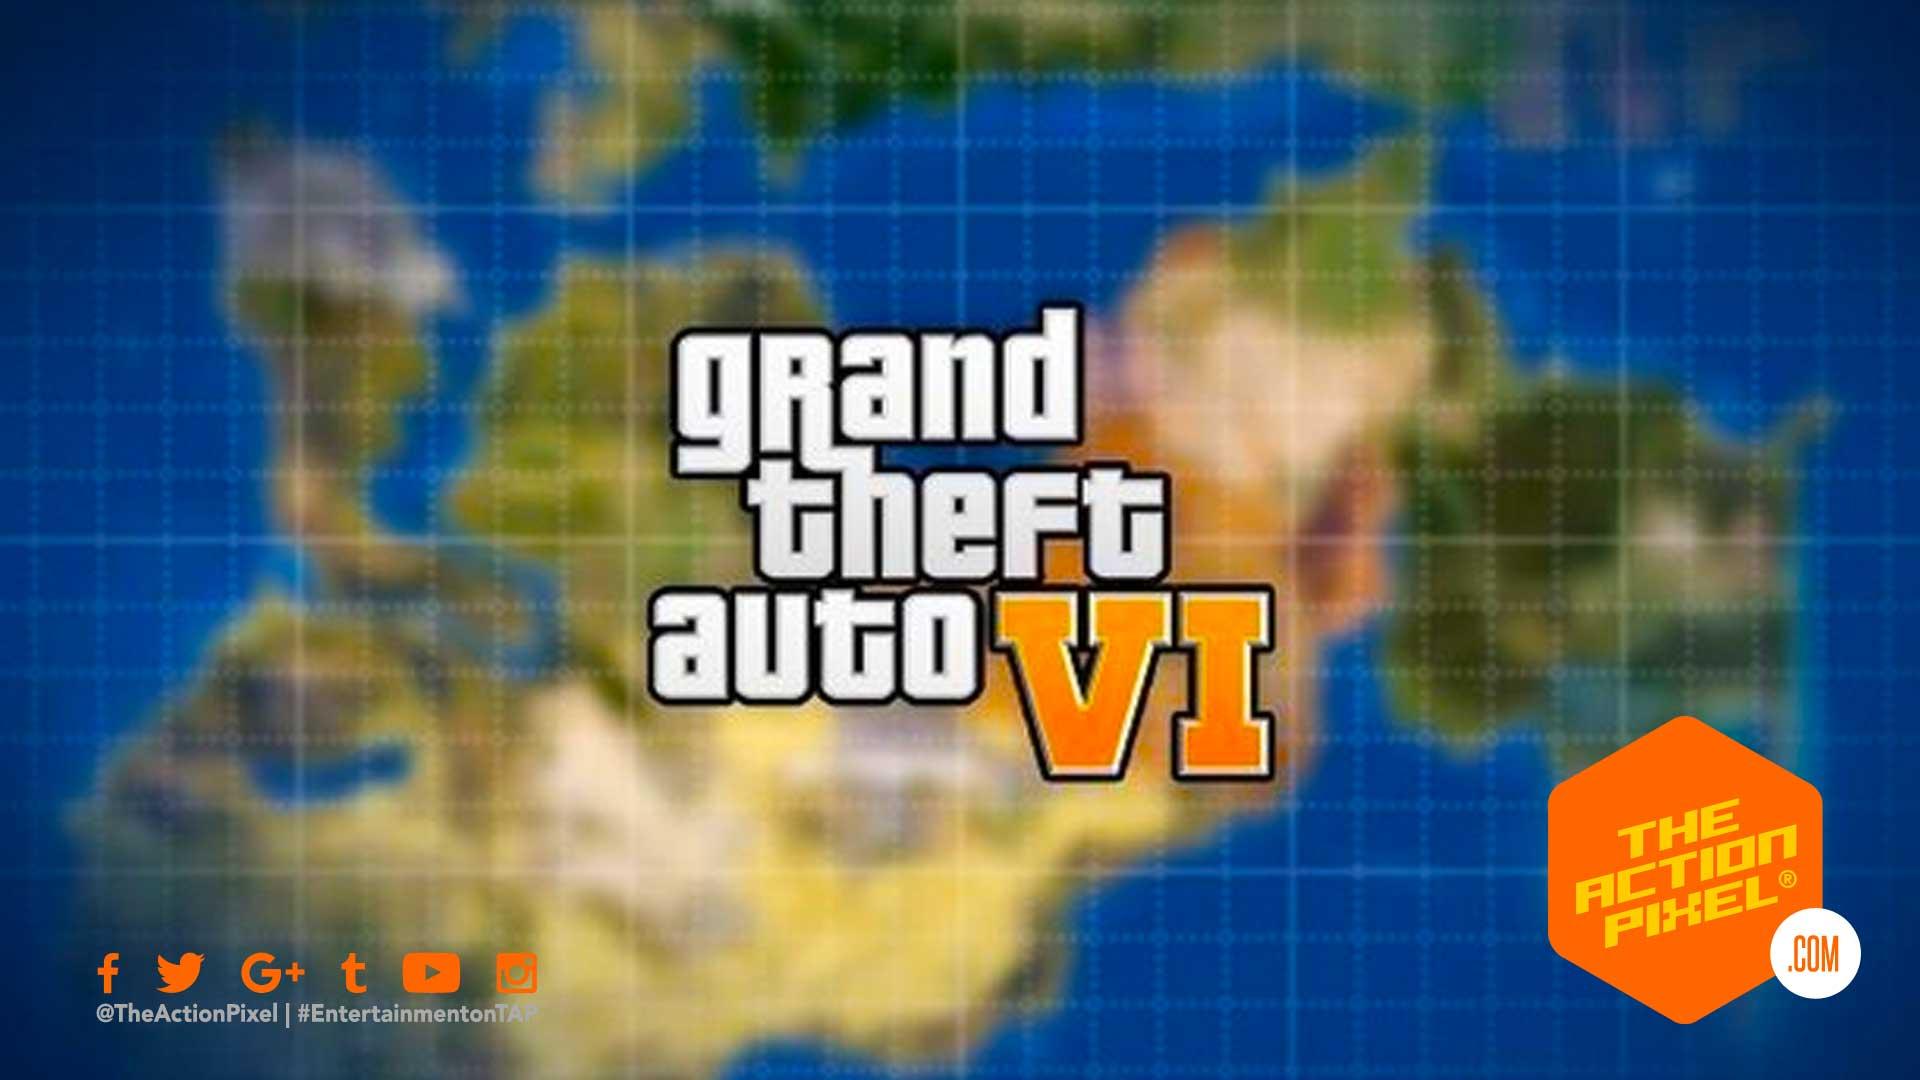 gta, gta5 ,gta 6, gta vi, gta vi map, the action pixel, featured, grand theft auto 6, grand theft auto 6 map, grand theft auto vi map, grand theft auto vi, vice city, los santos, liberty city, entertainment on tap